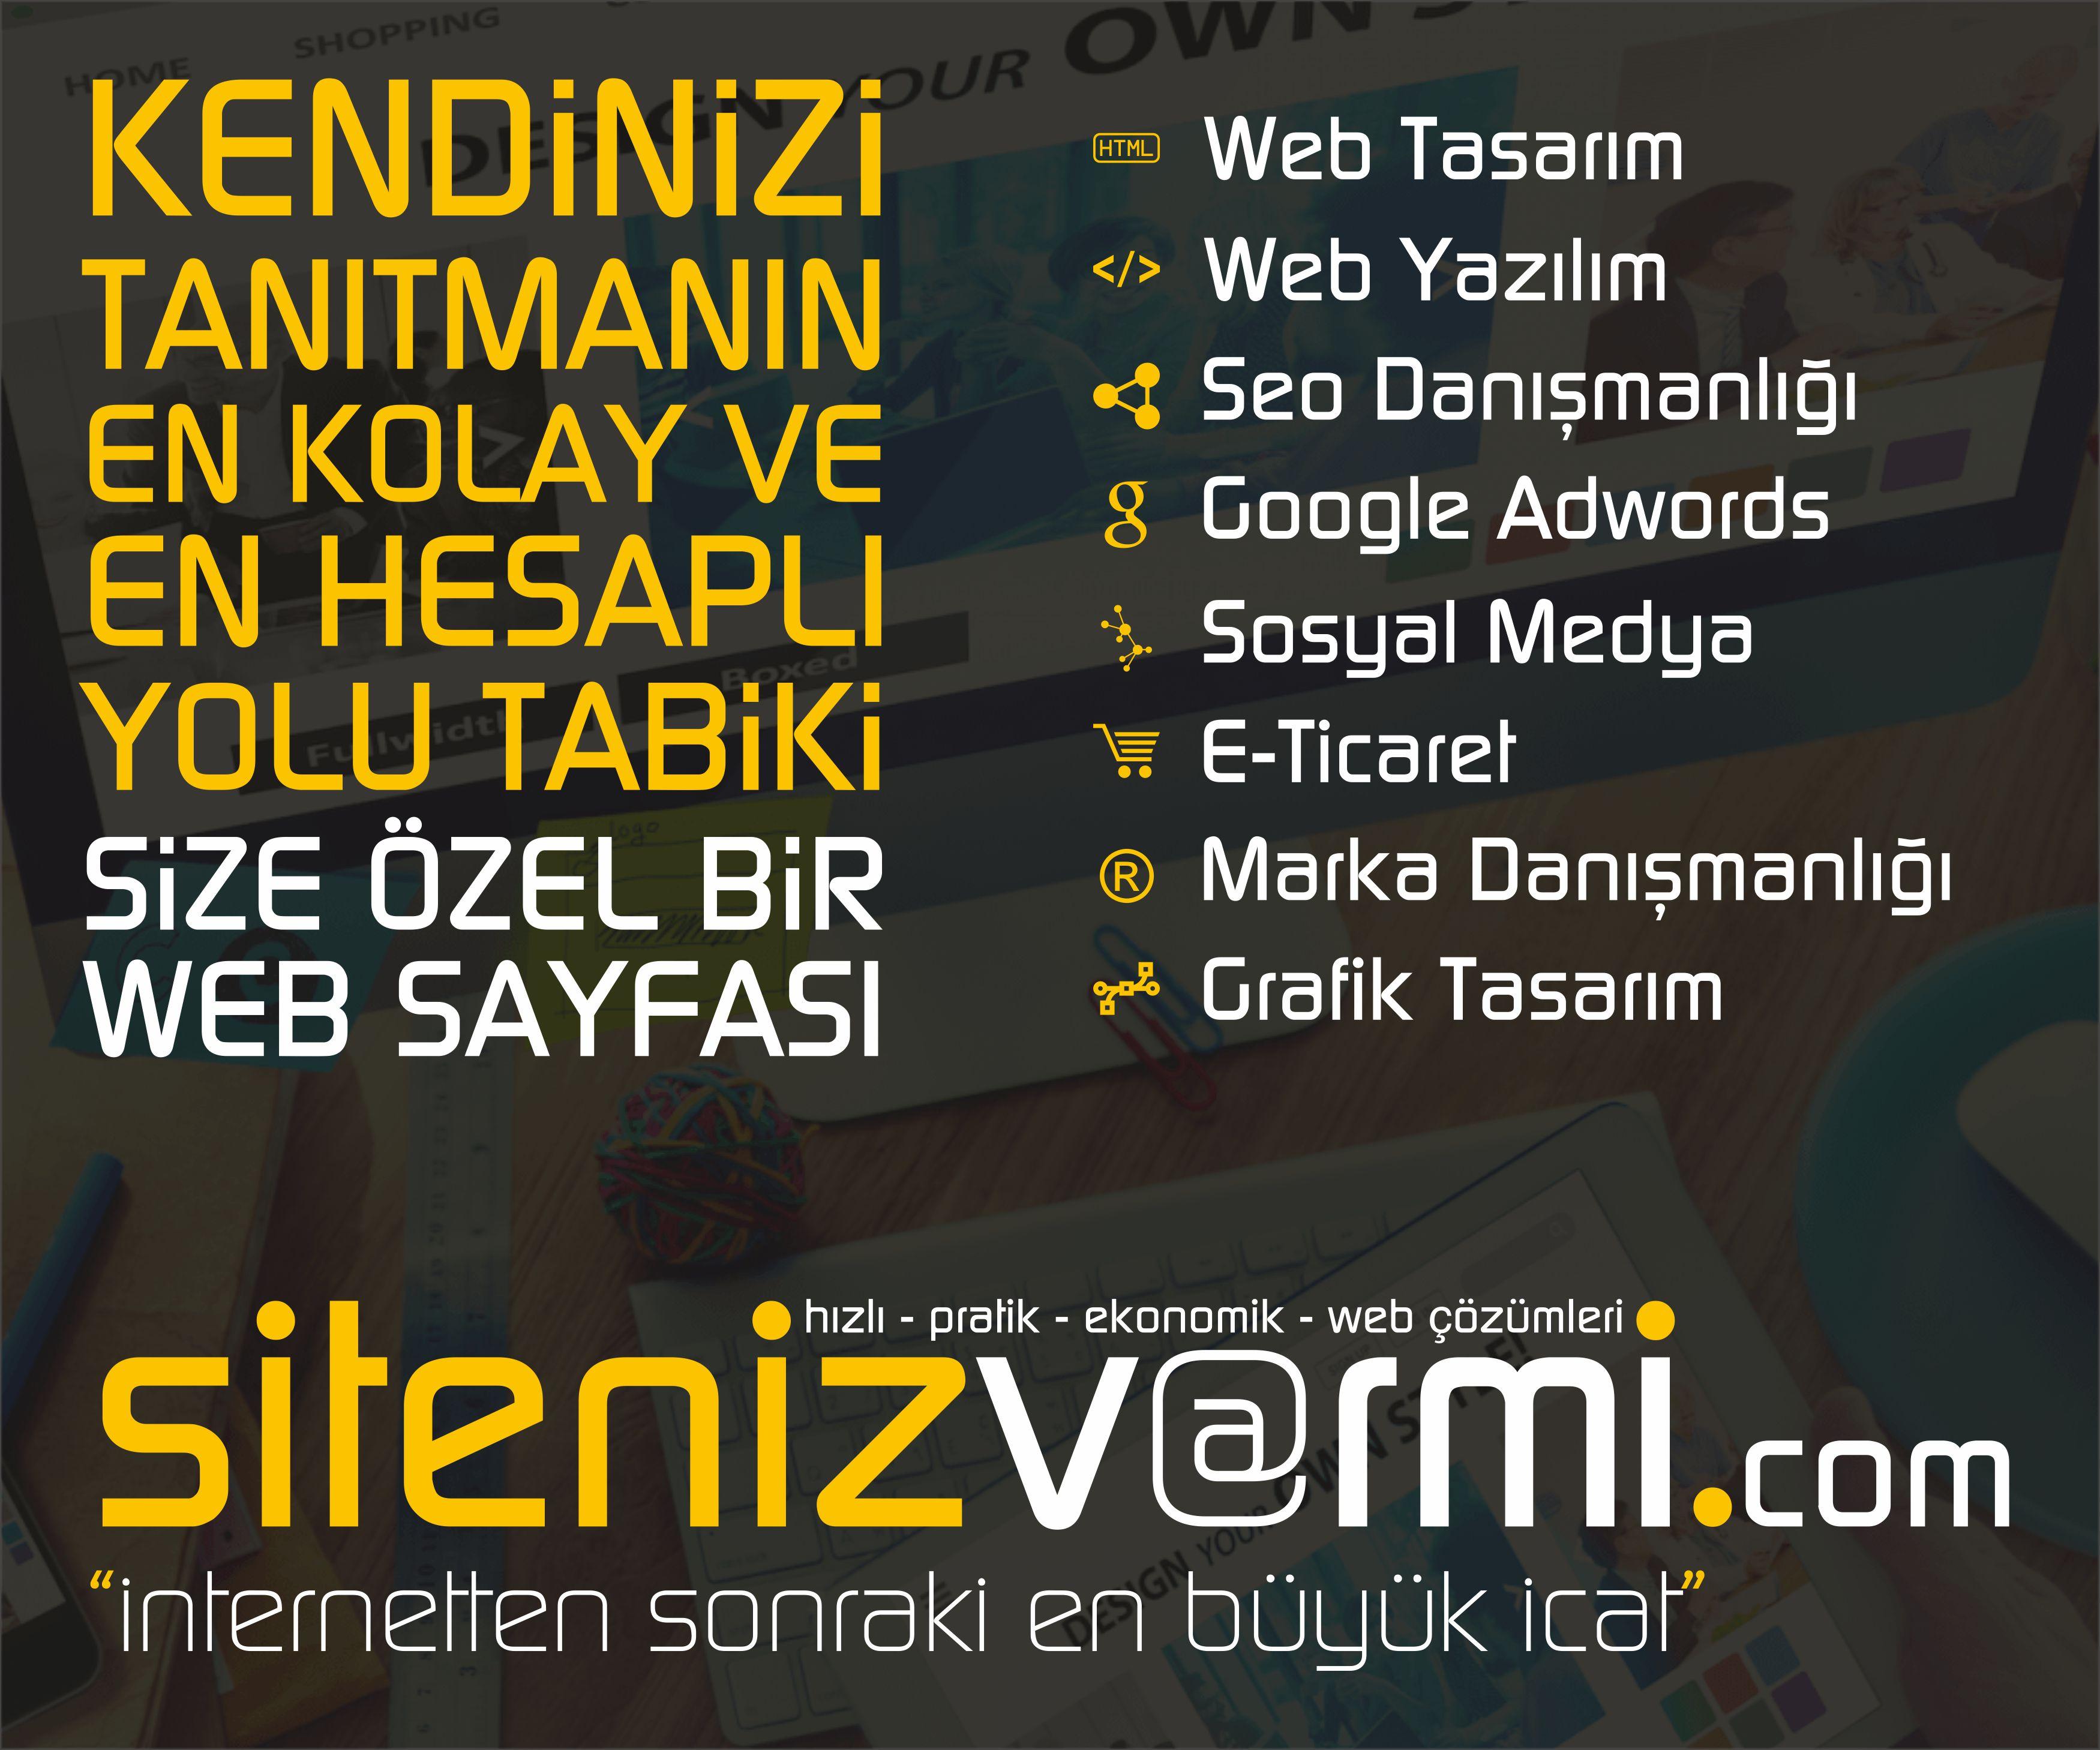 sitenizvarmi.com web tasarım